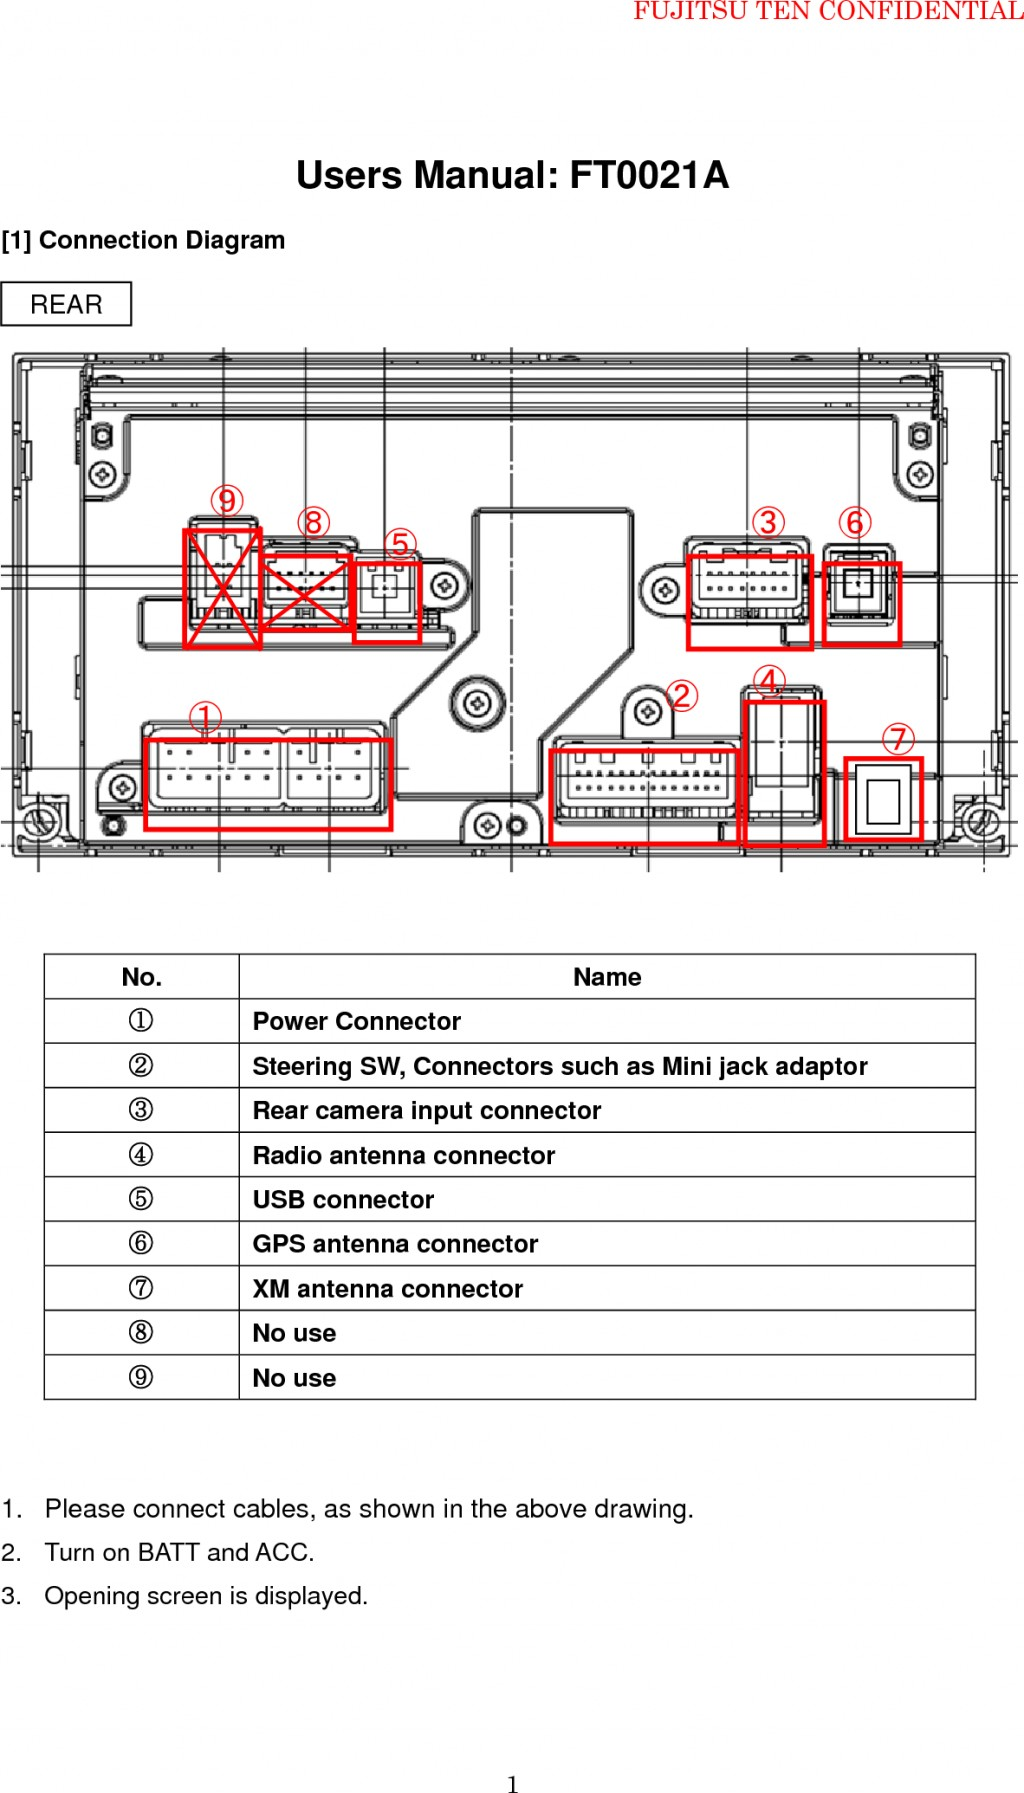 fujitsu ten 86140 wiring diagram mg tf toyota 86120 image